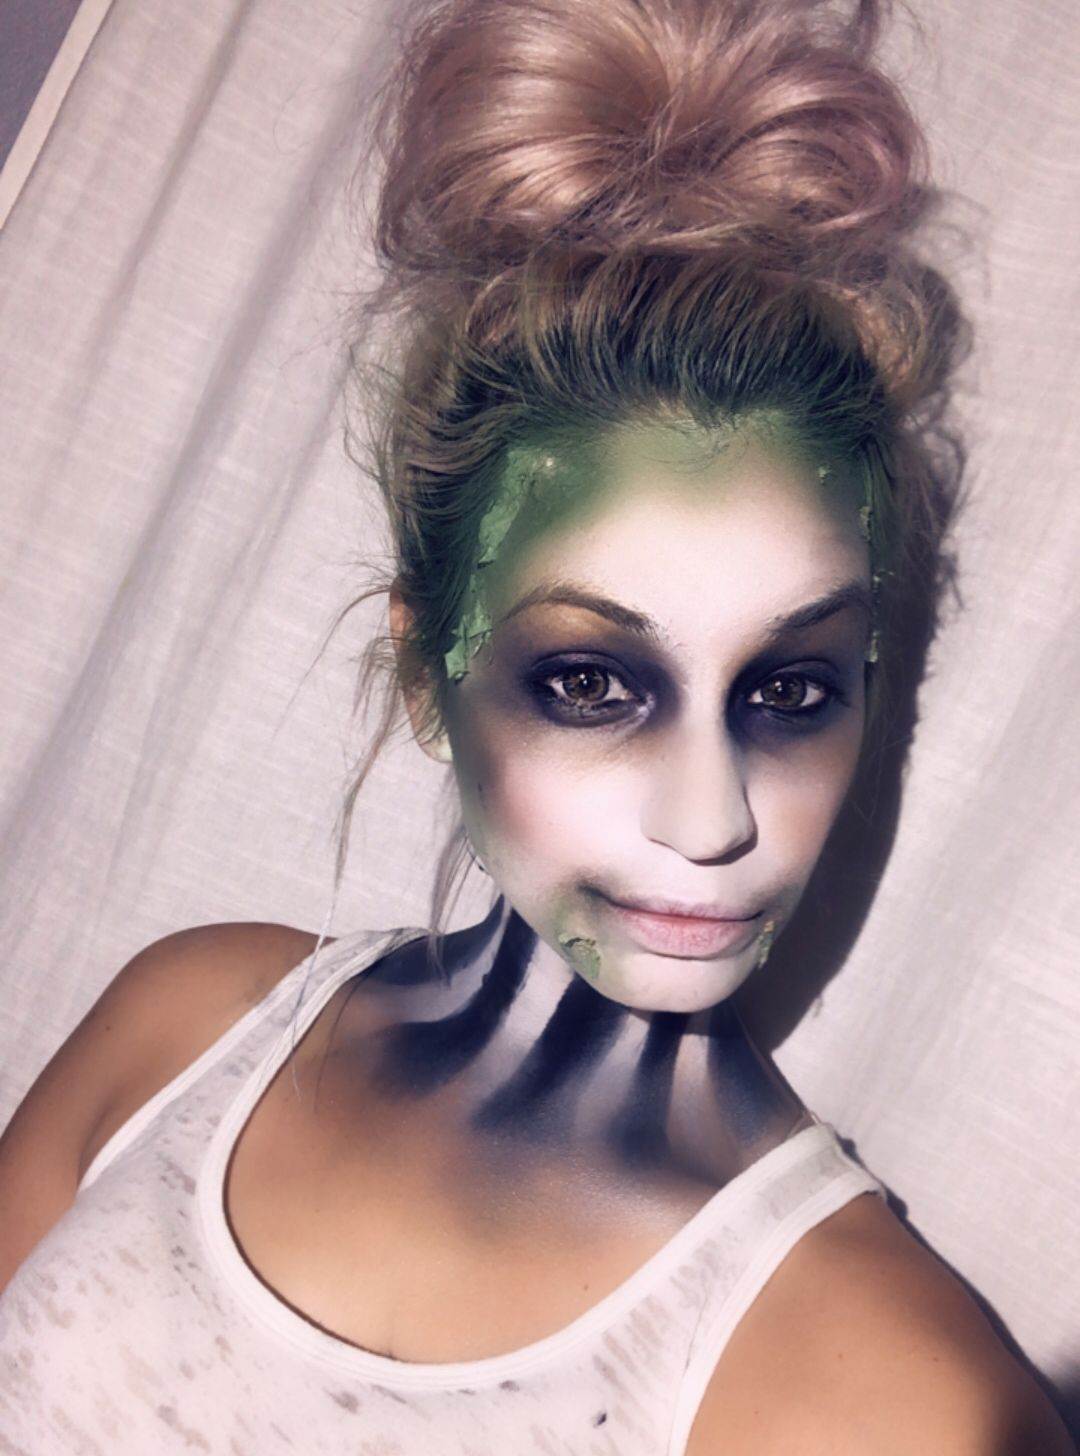 _hairgypsy_ Halloween 2018 makeup hair Green hair beetle